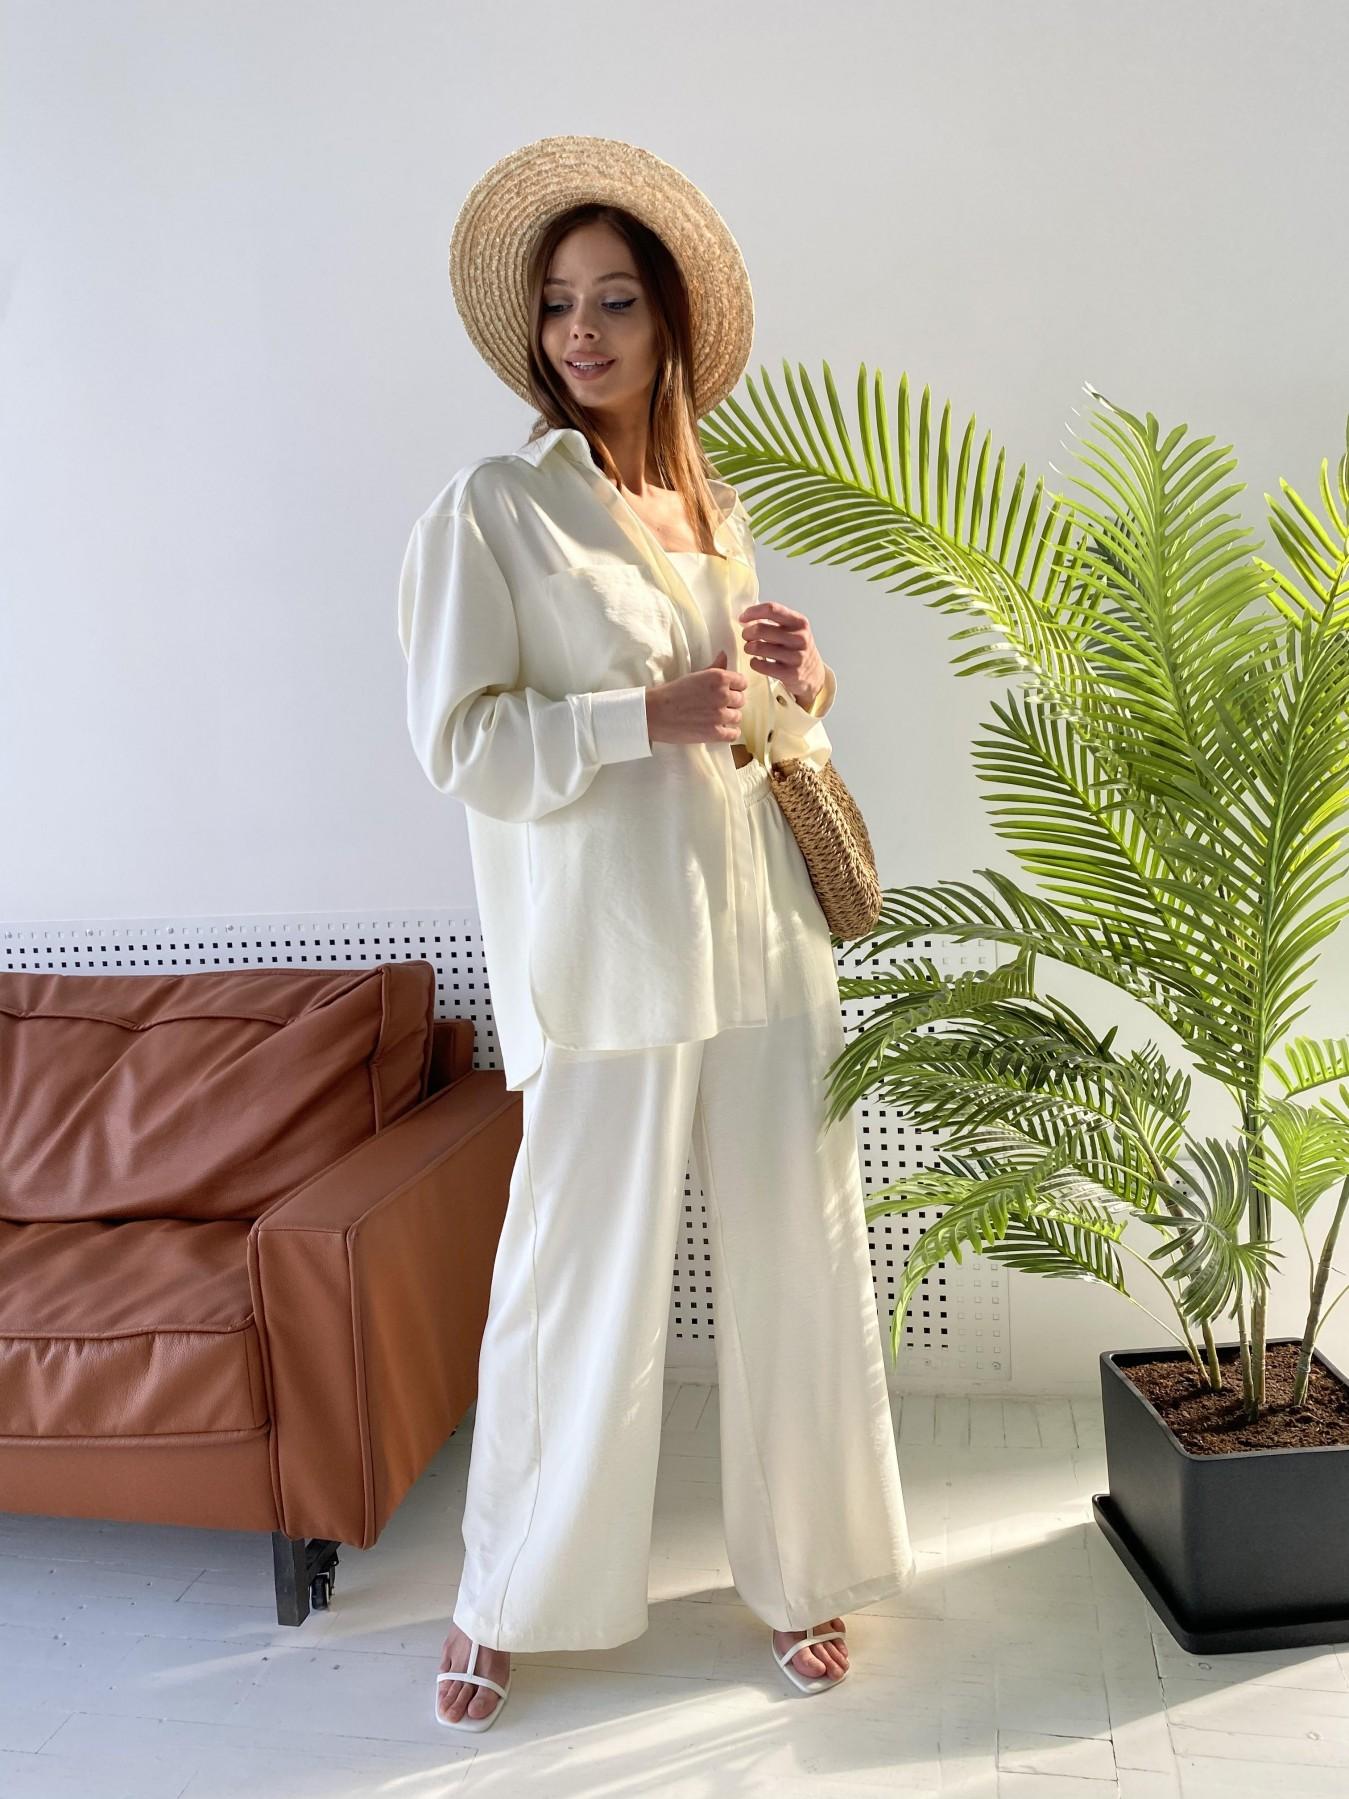 Квадро костюм американский из ткани креп (4 ед) 11303 АРТ. 47839 Цвет: Молоко - фото 6, интернет магазин tm-modus.ru